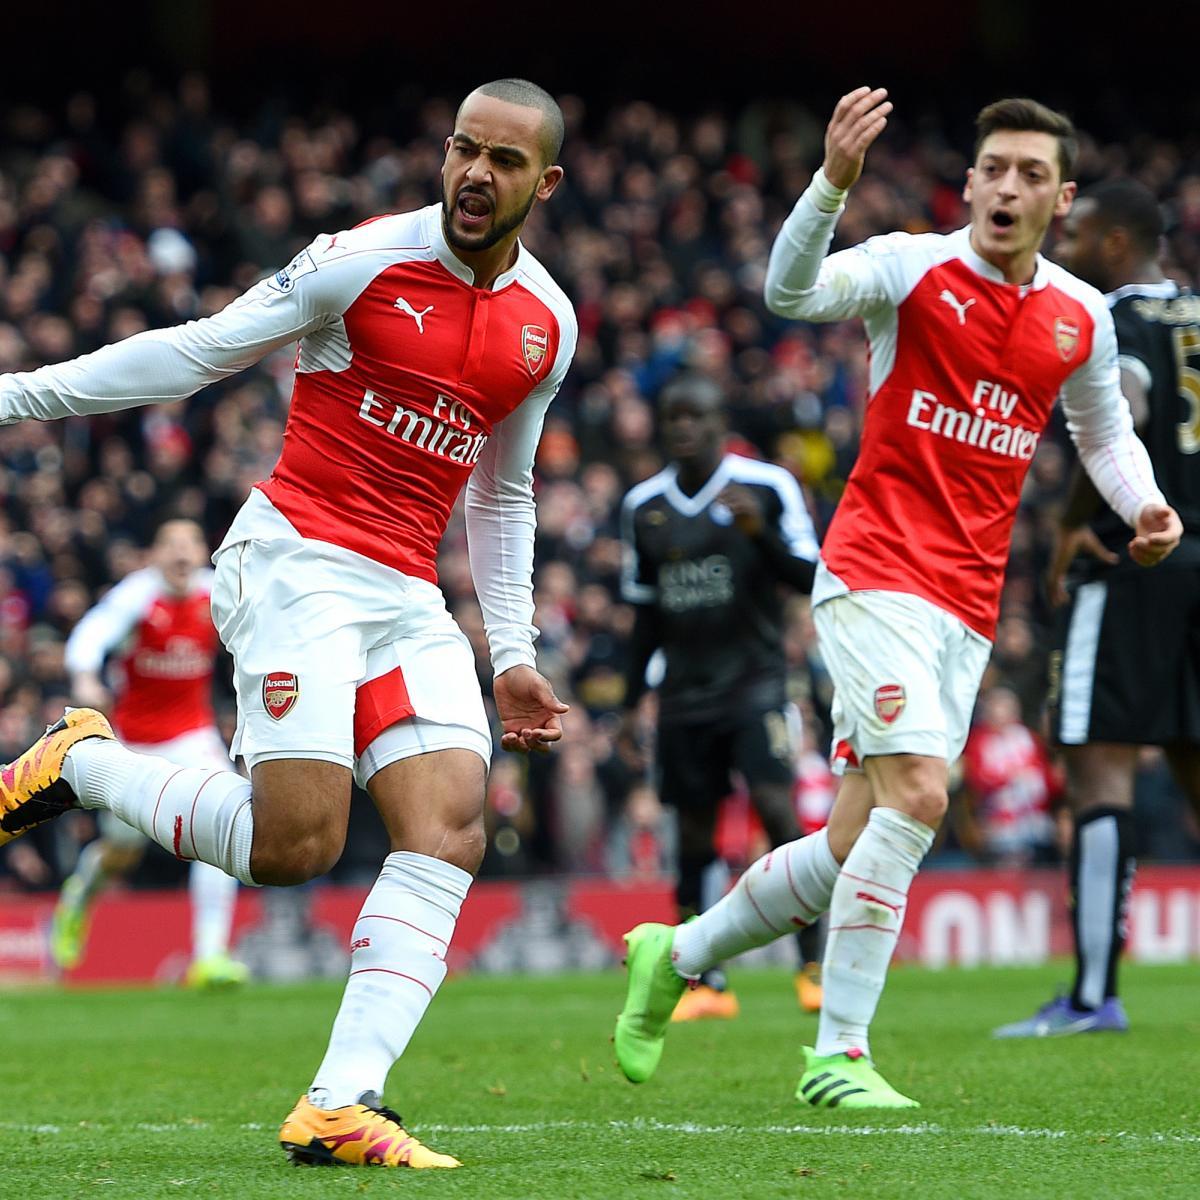 Arsenal Vs Barcelona Live Score Highlights From: Arsenal Vs. Hull City: Live Score, Highlights From FA Cup